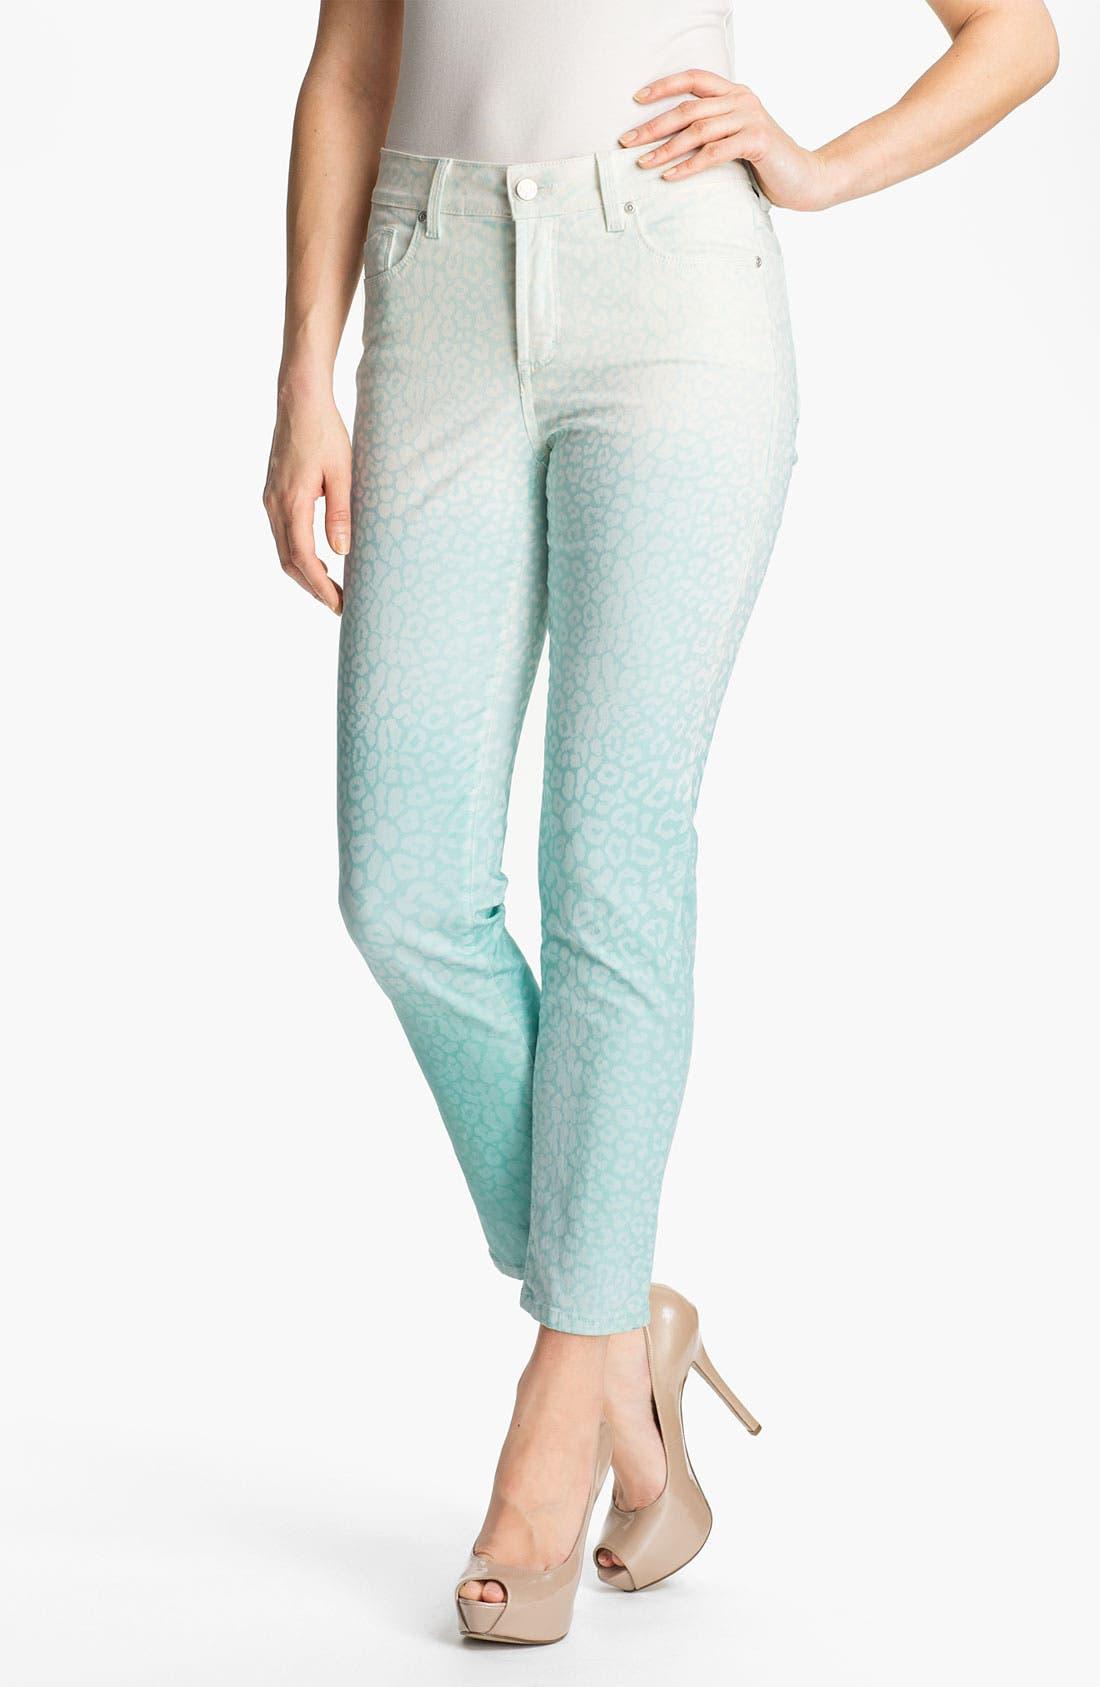 Main Image - NYDJ 'Alisha - Chevy' Skinny Stretch Ankle Jeans